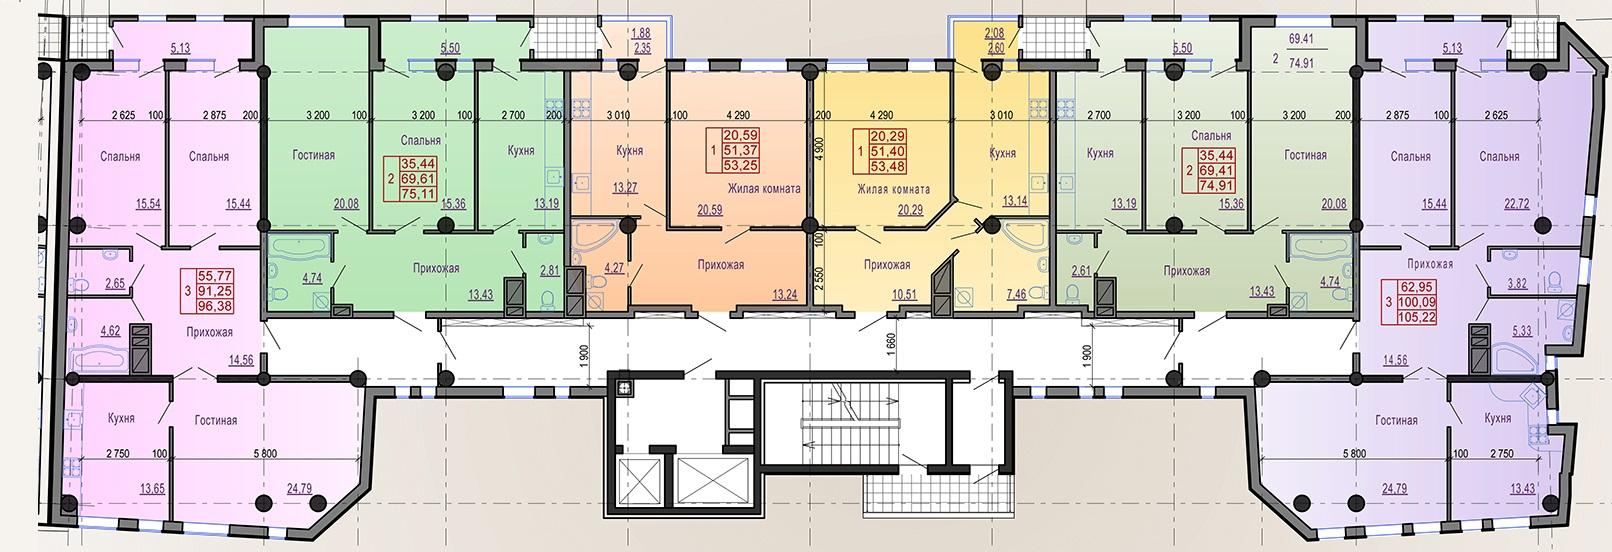 Планировка квартир в бизнес-классе